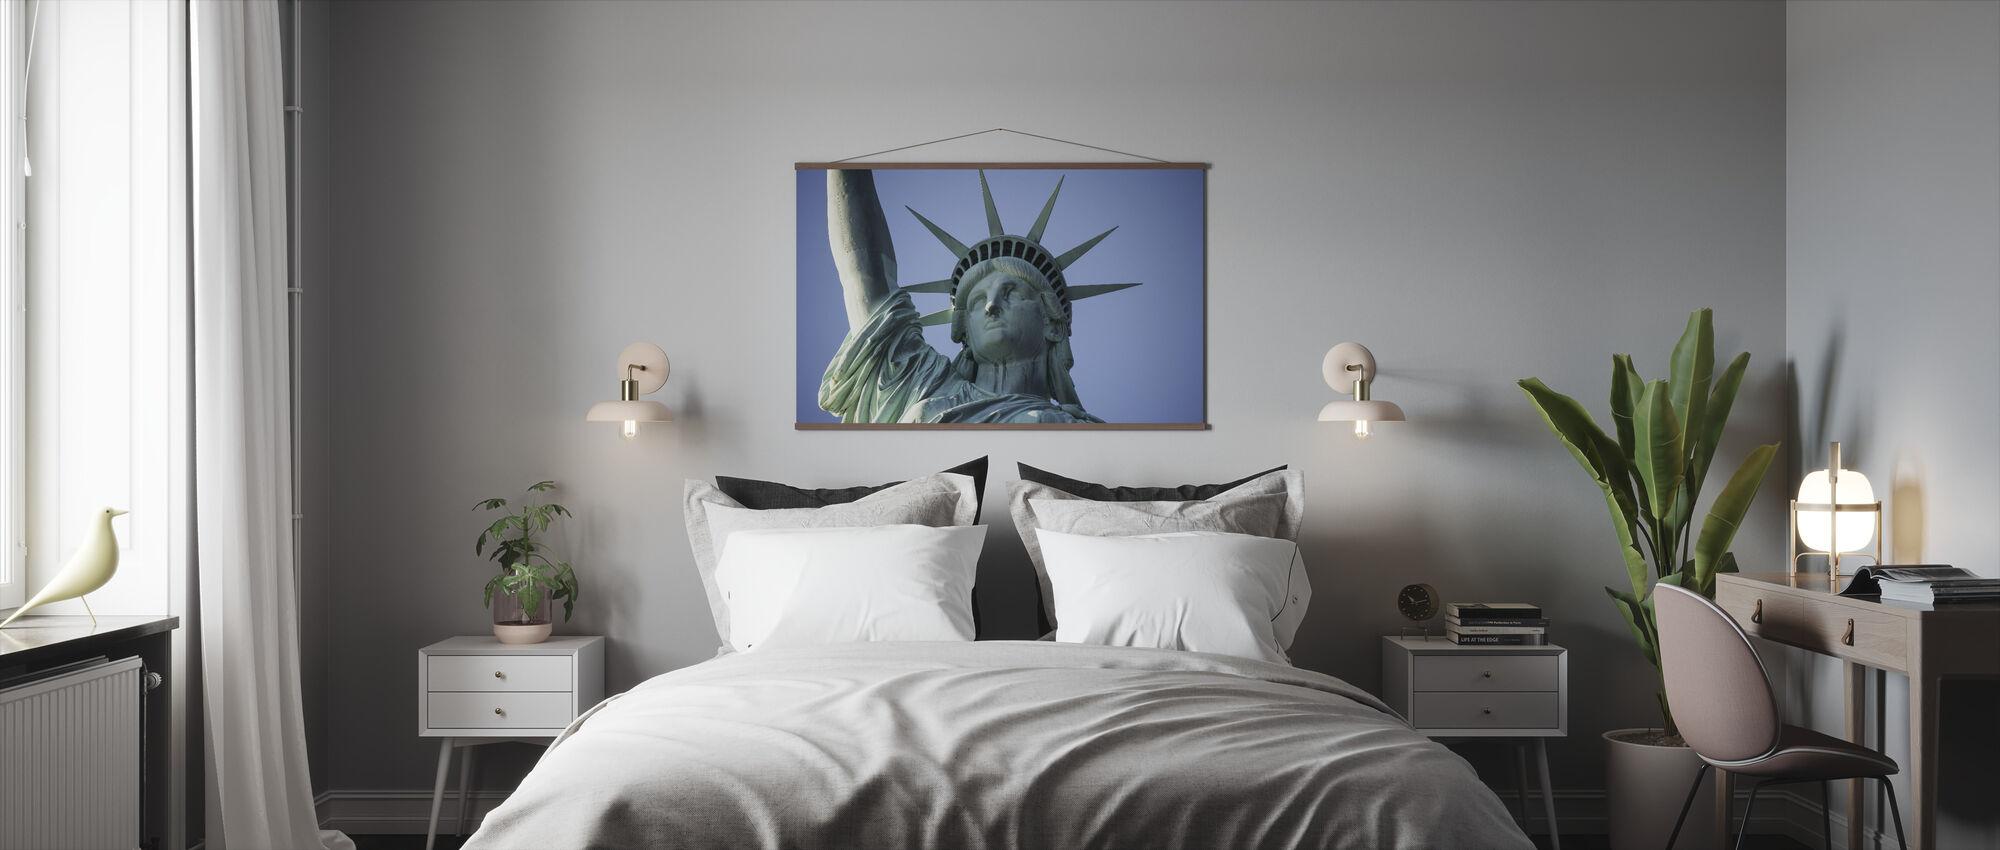 Vapaudenpatsas - Juliste - Makuuhuone